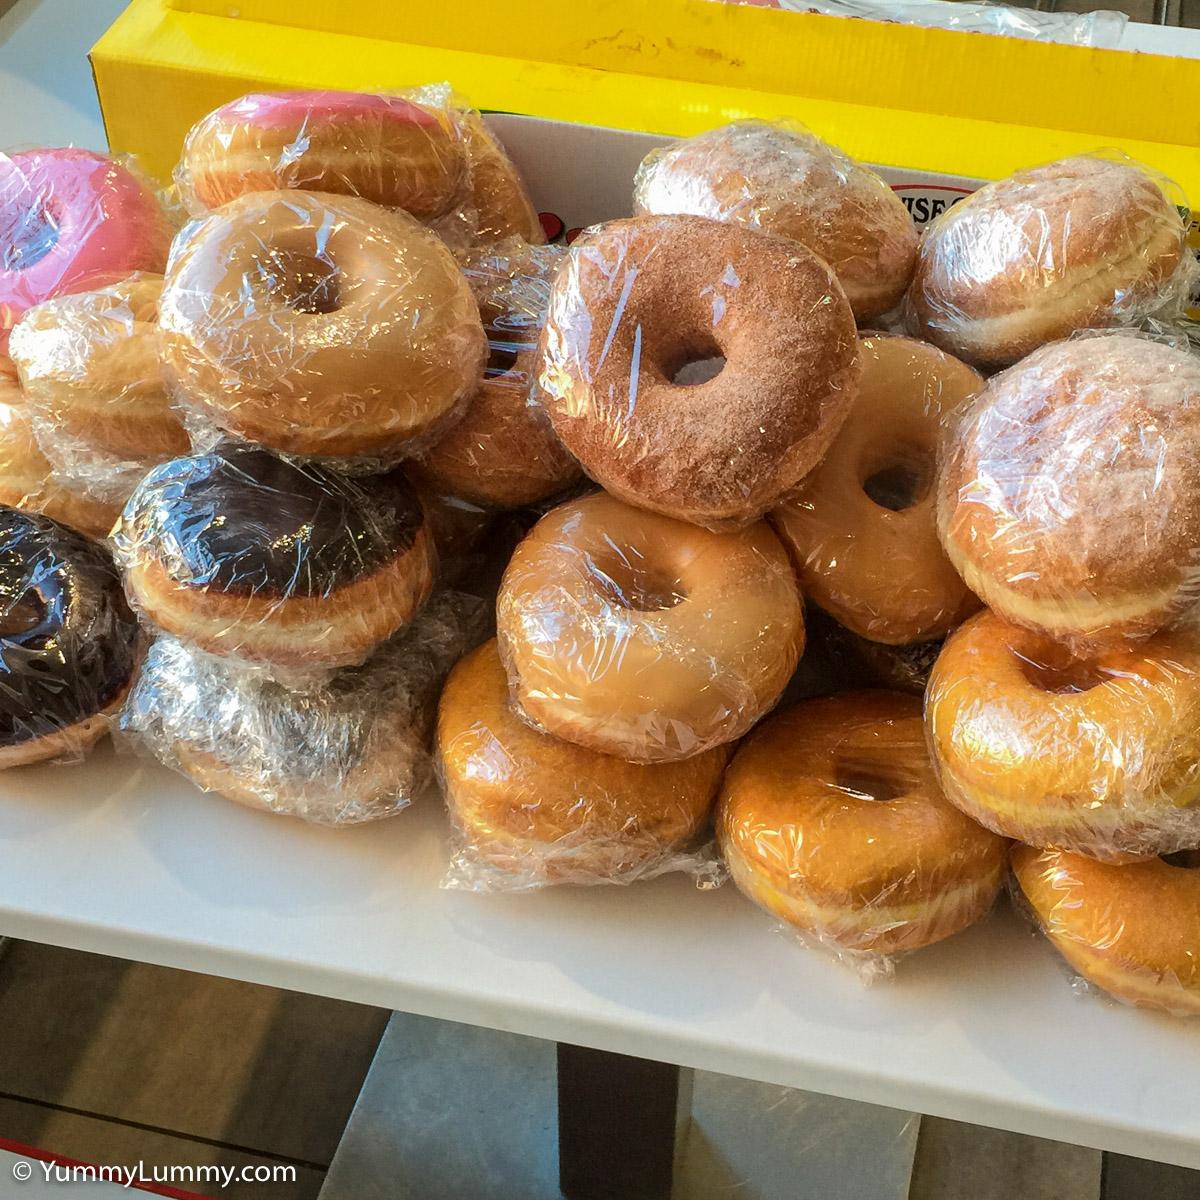 TGIF doughnuts